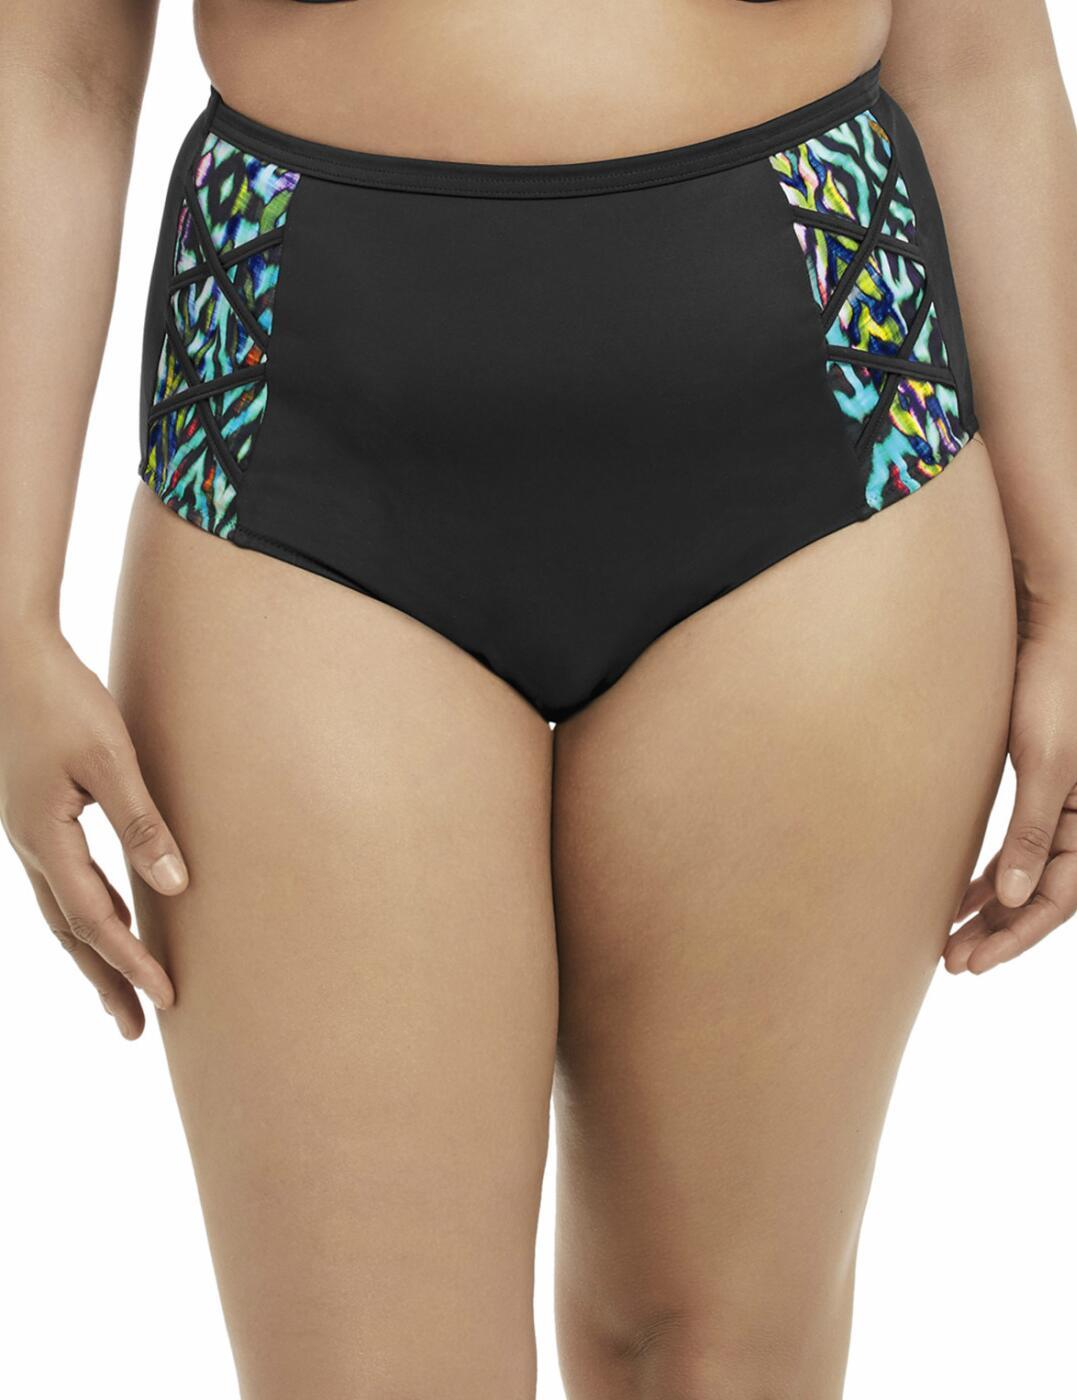 7113 Elomi Tribal Instinct Classic Bikini Brief Black - 7113 Bikini Brief